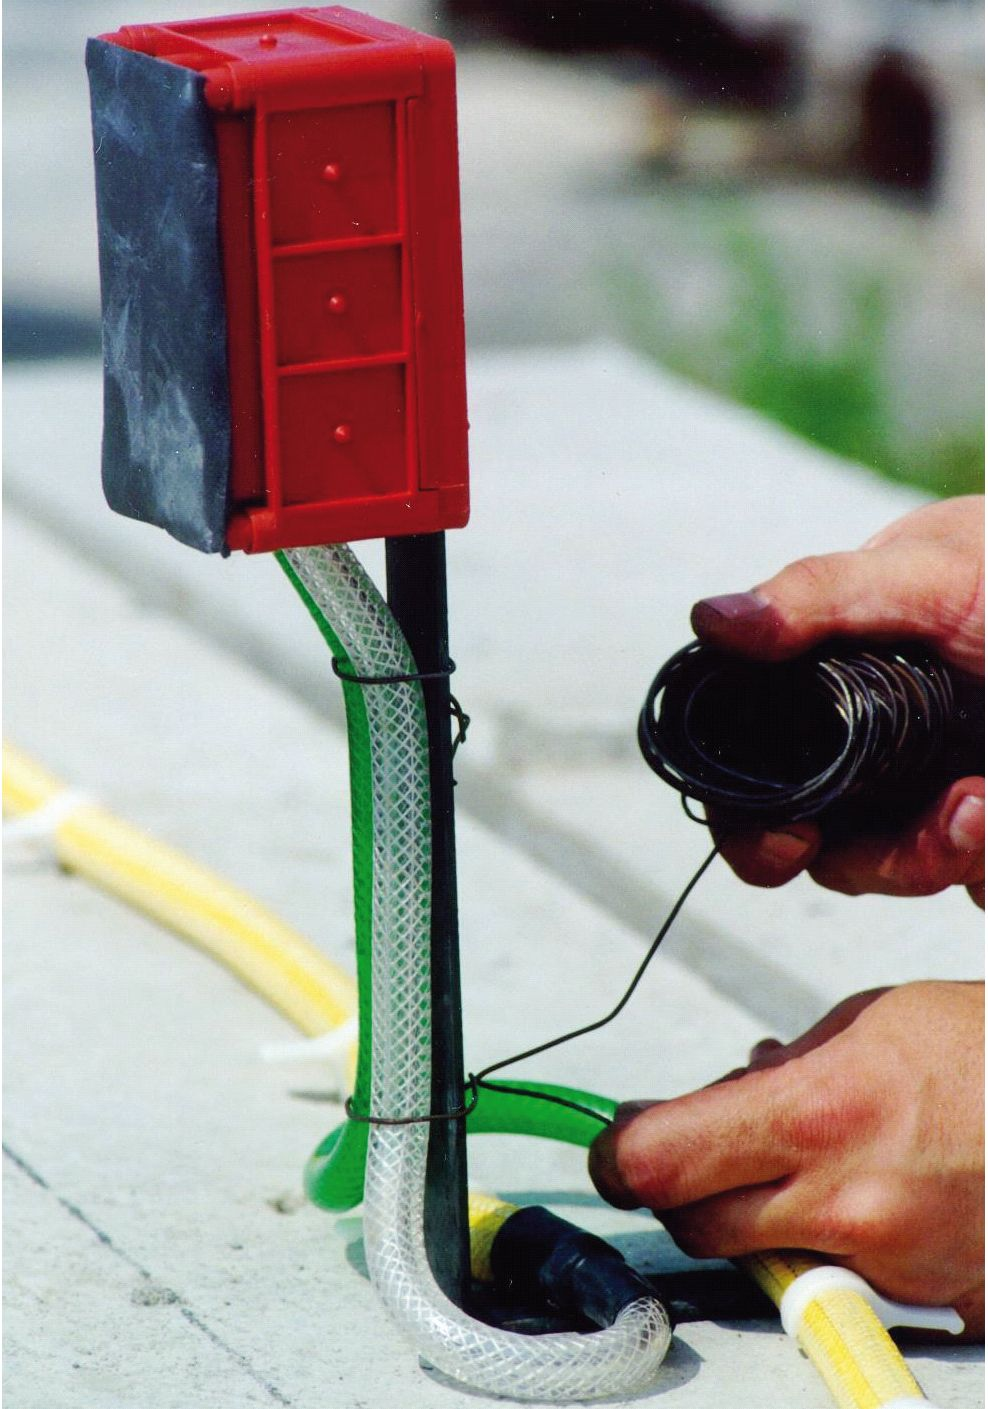 Injektering betong injekteringsslang